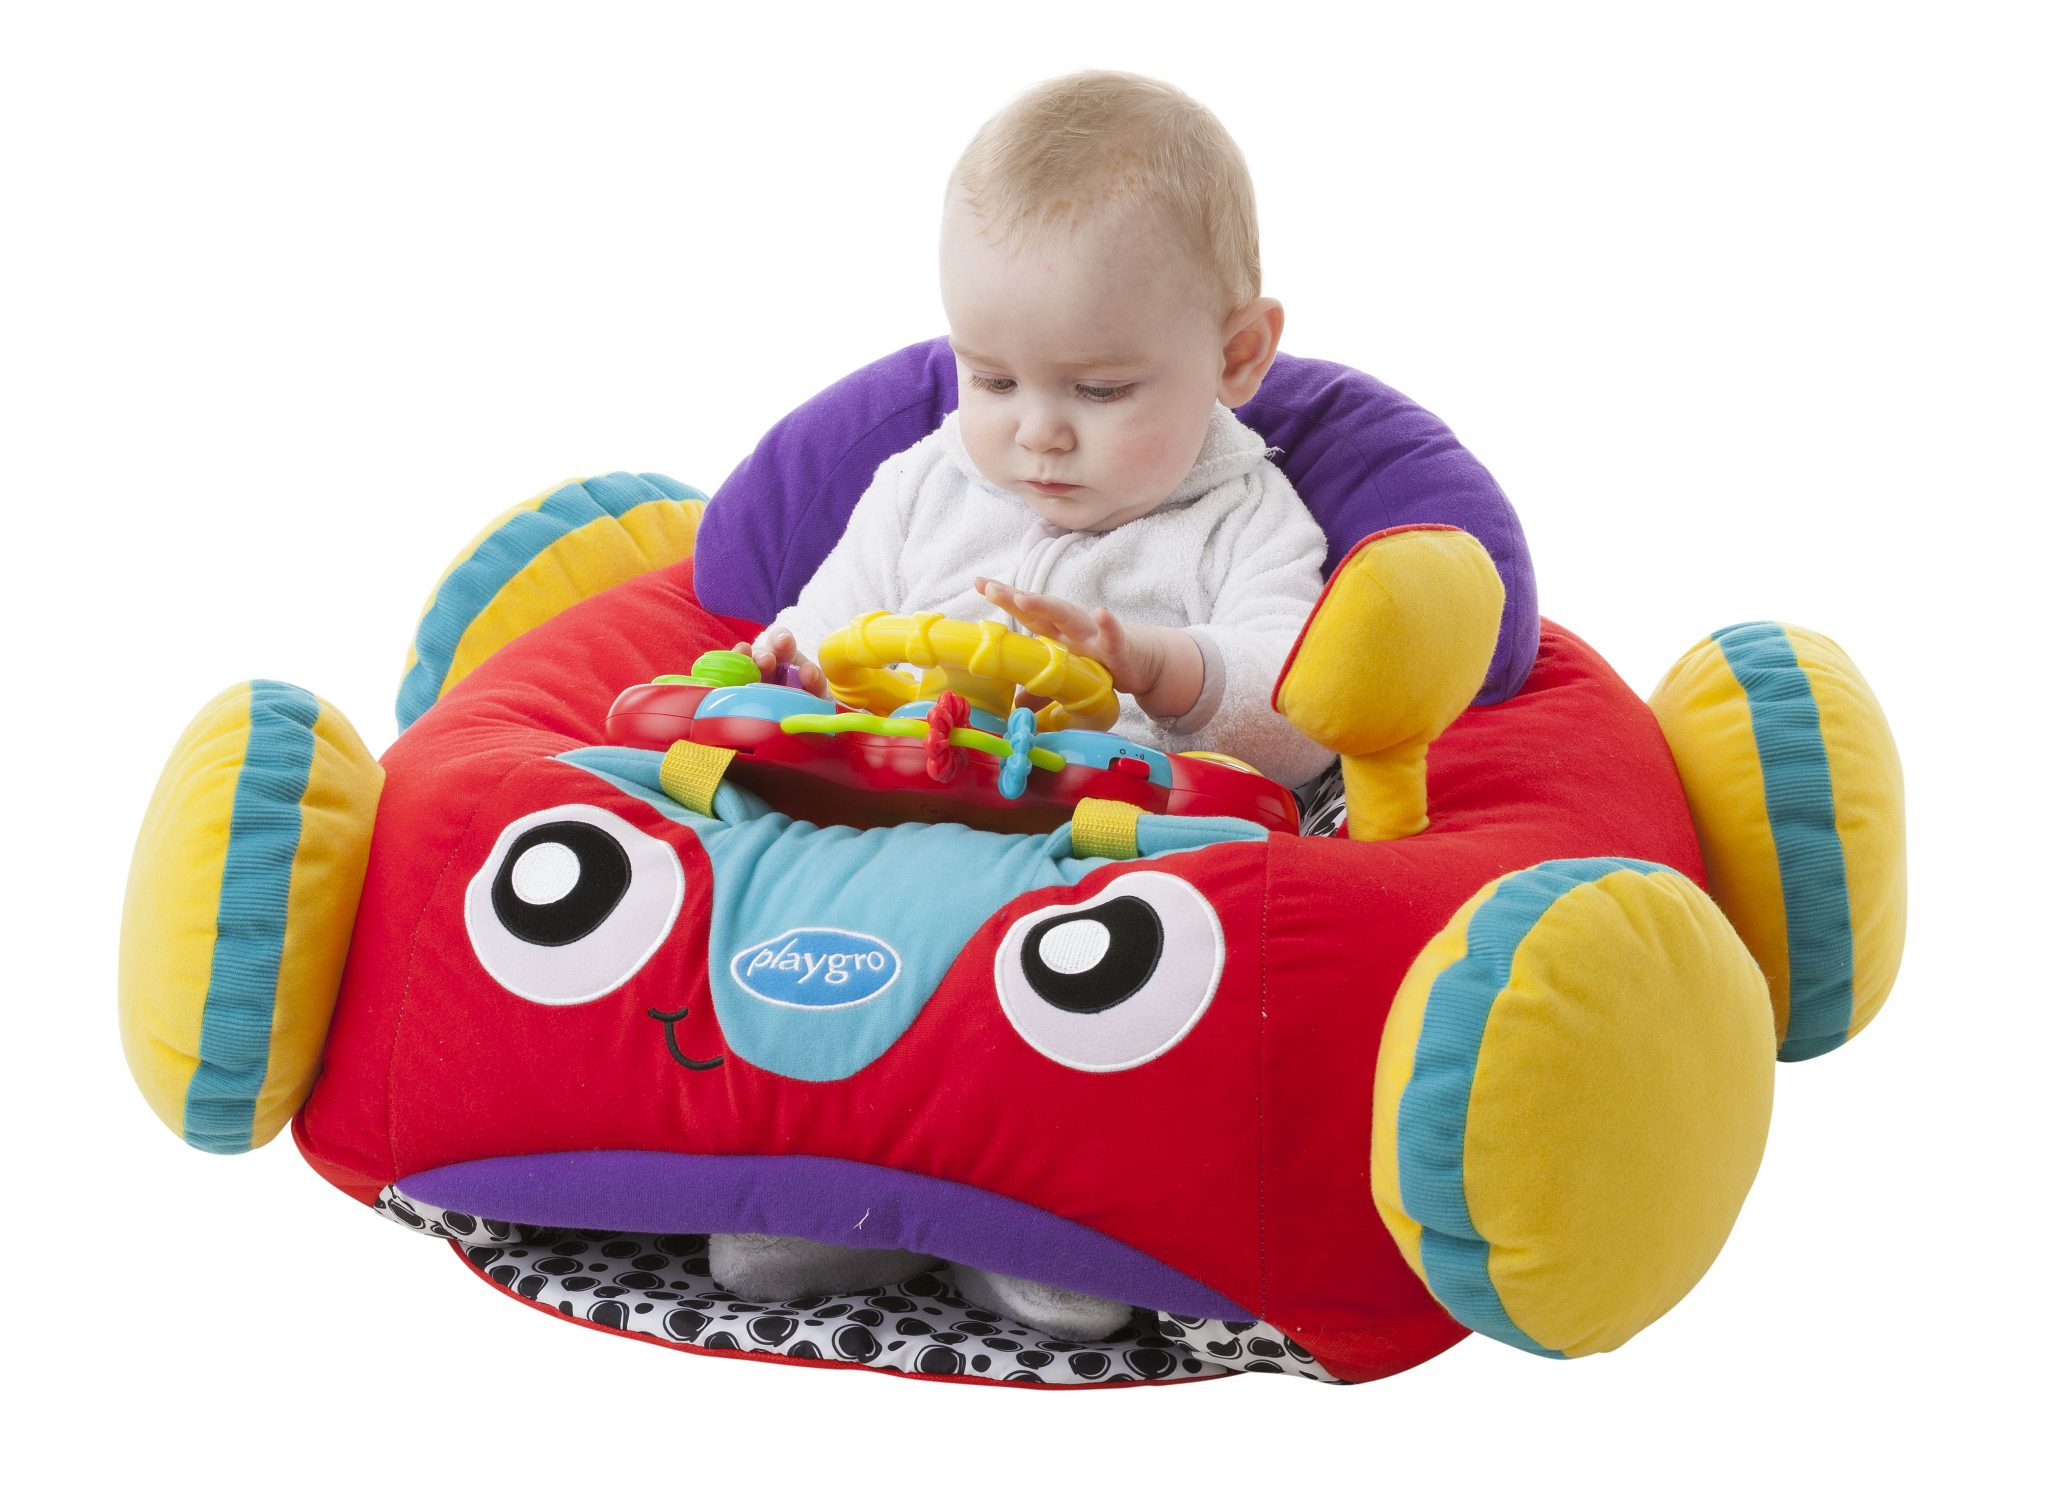 Playgro Music and Lights Comfy Car